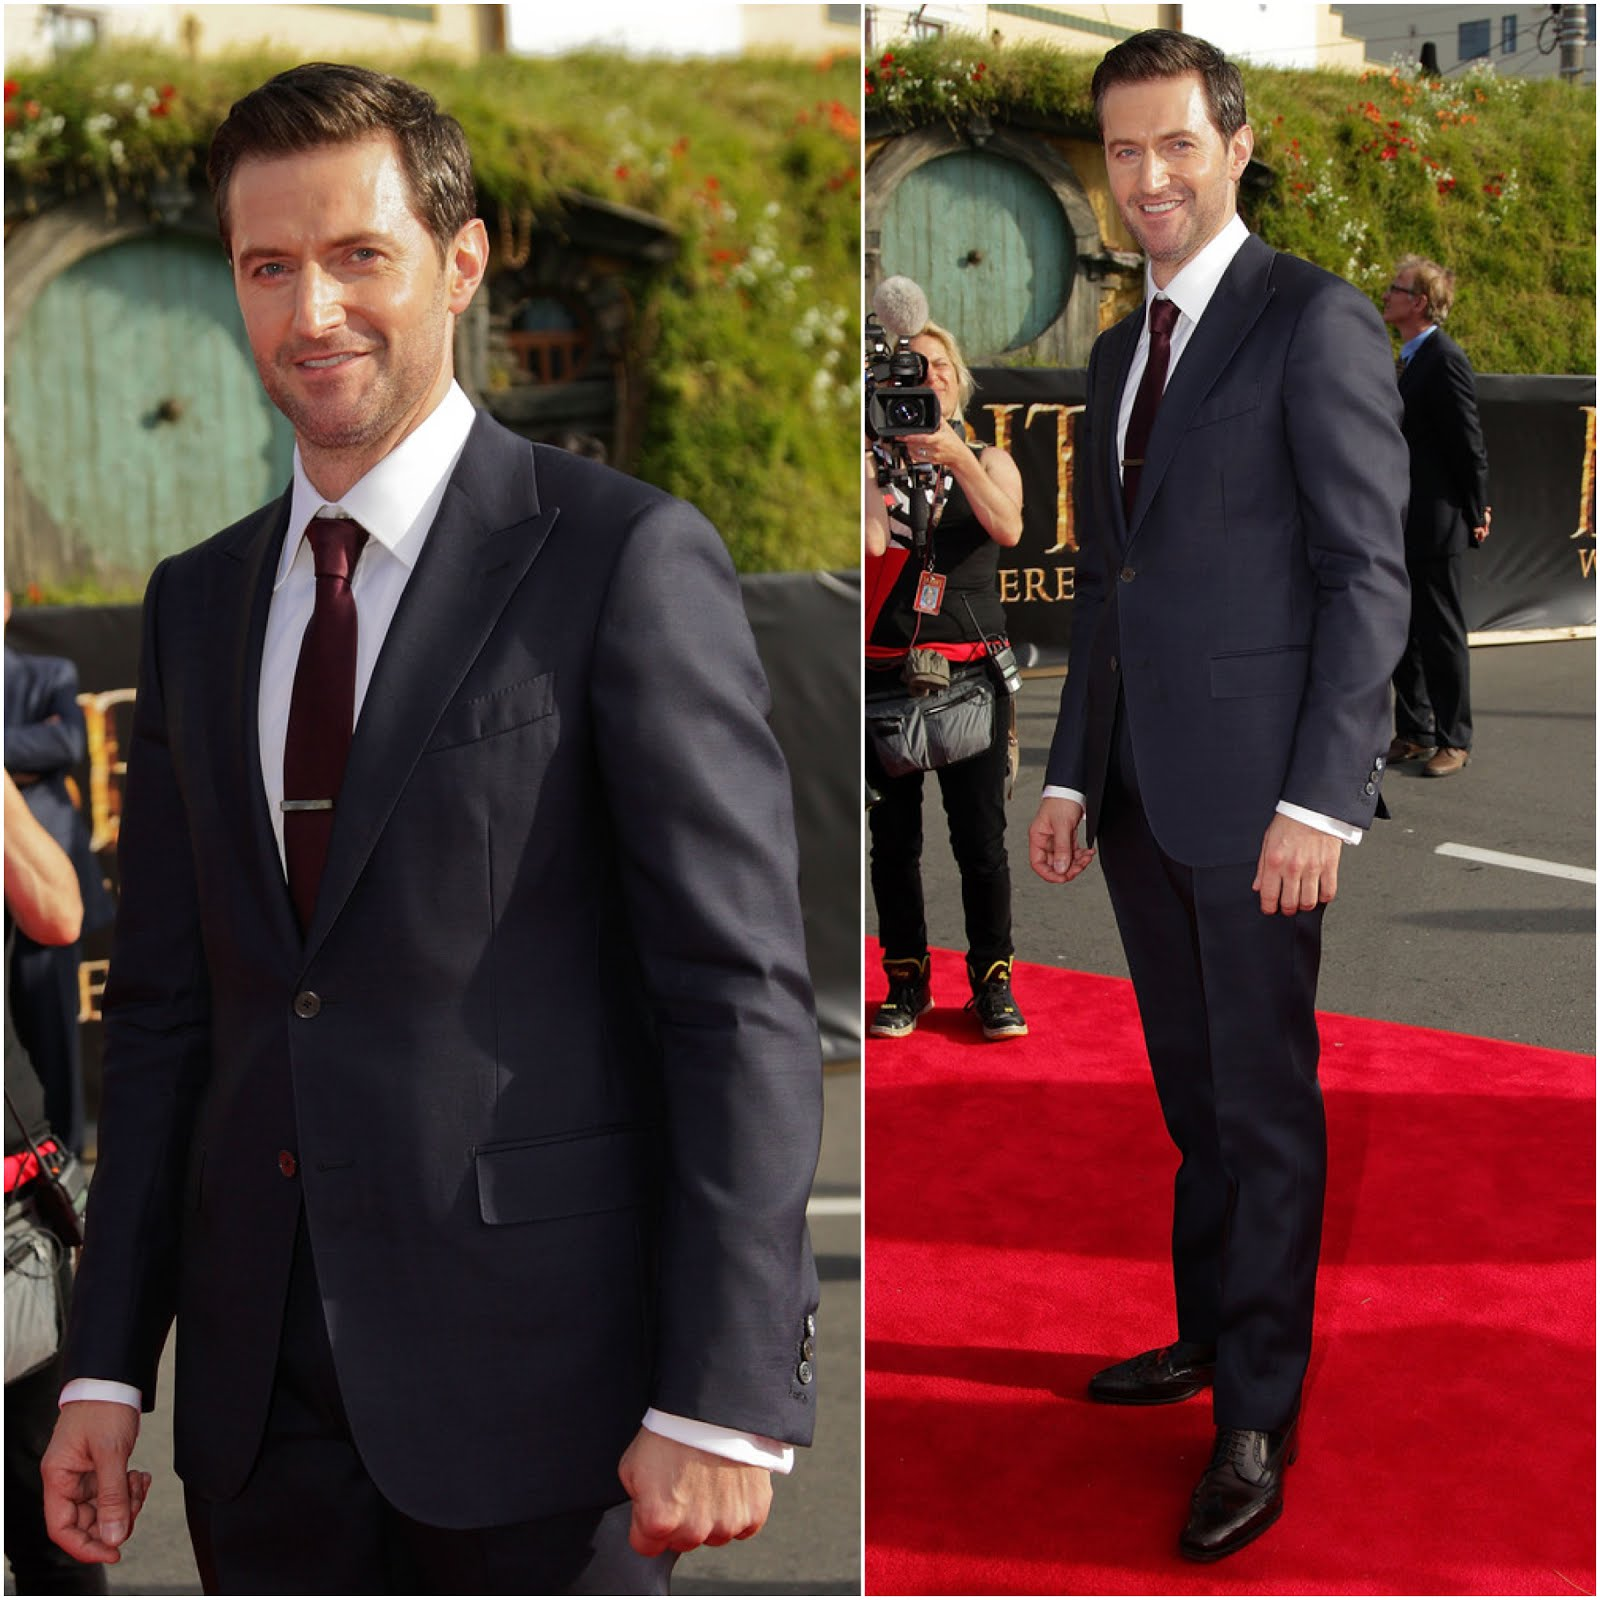 00O00 London Menswear Style Celebrity Style Richard Armitage in Ermenegildo Zegna -